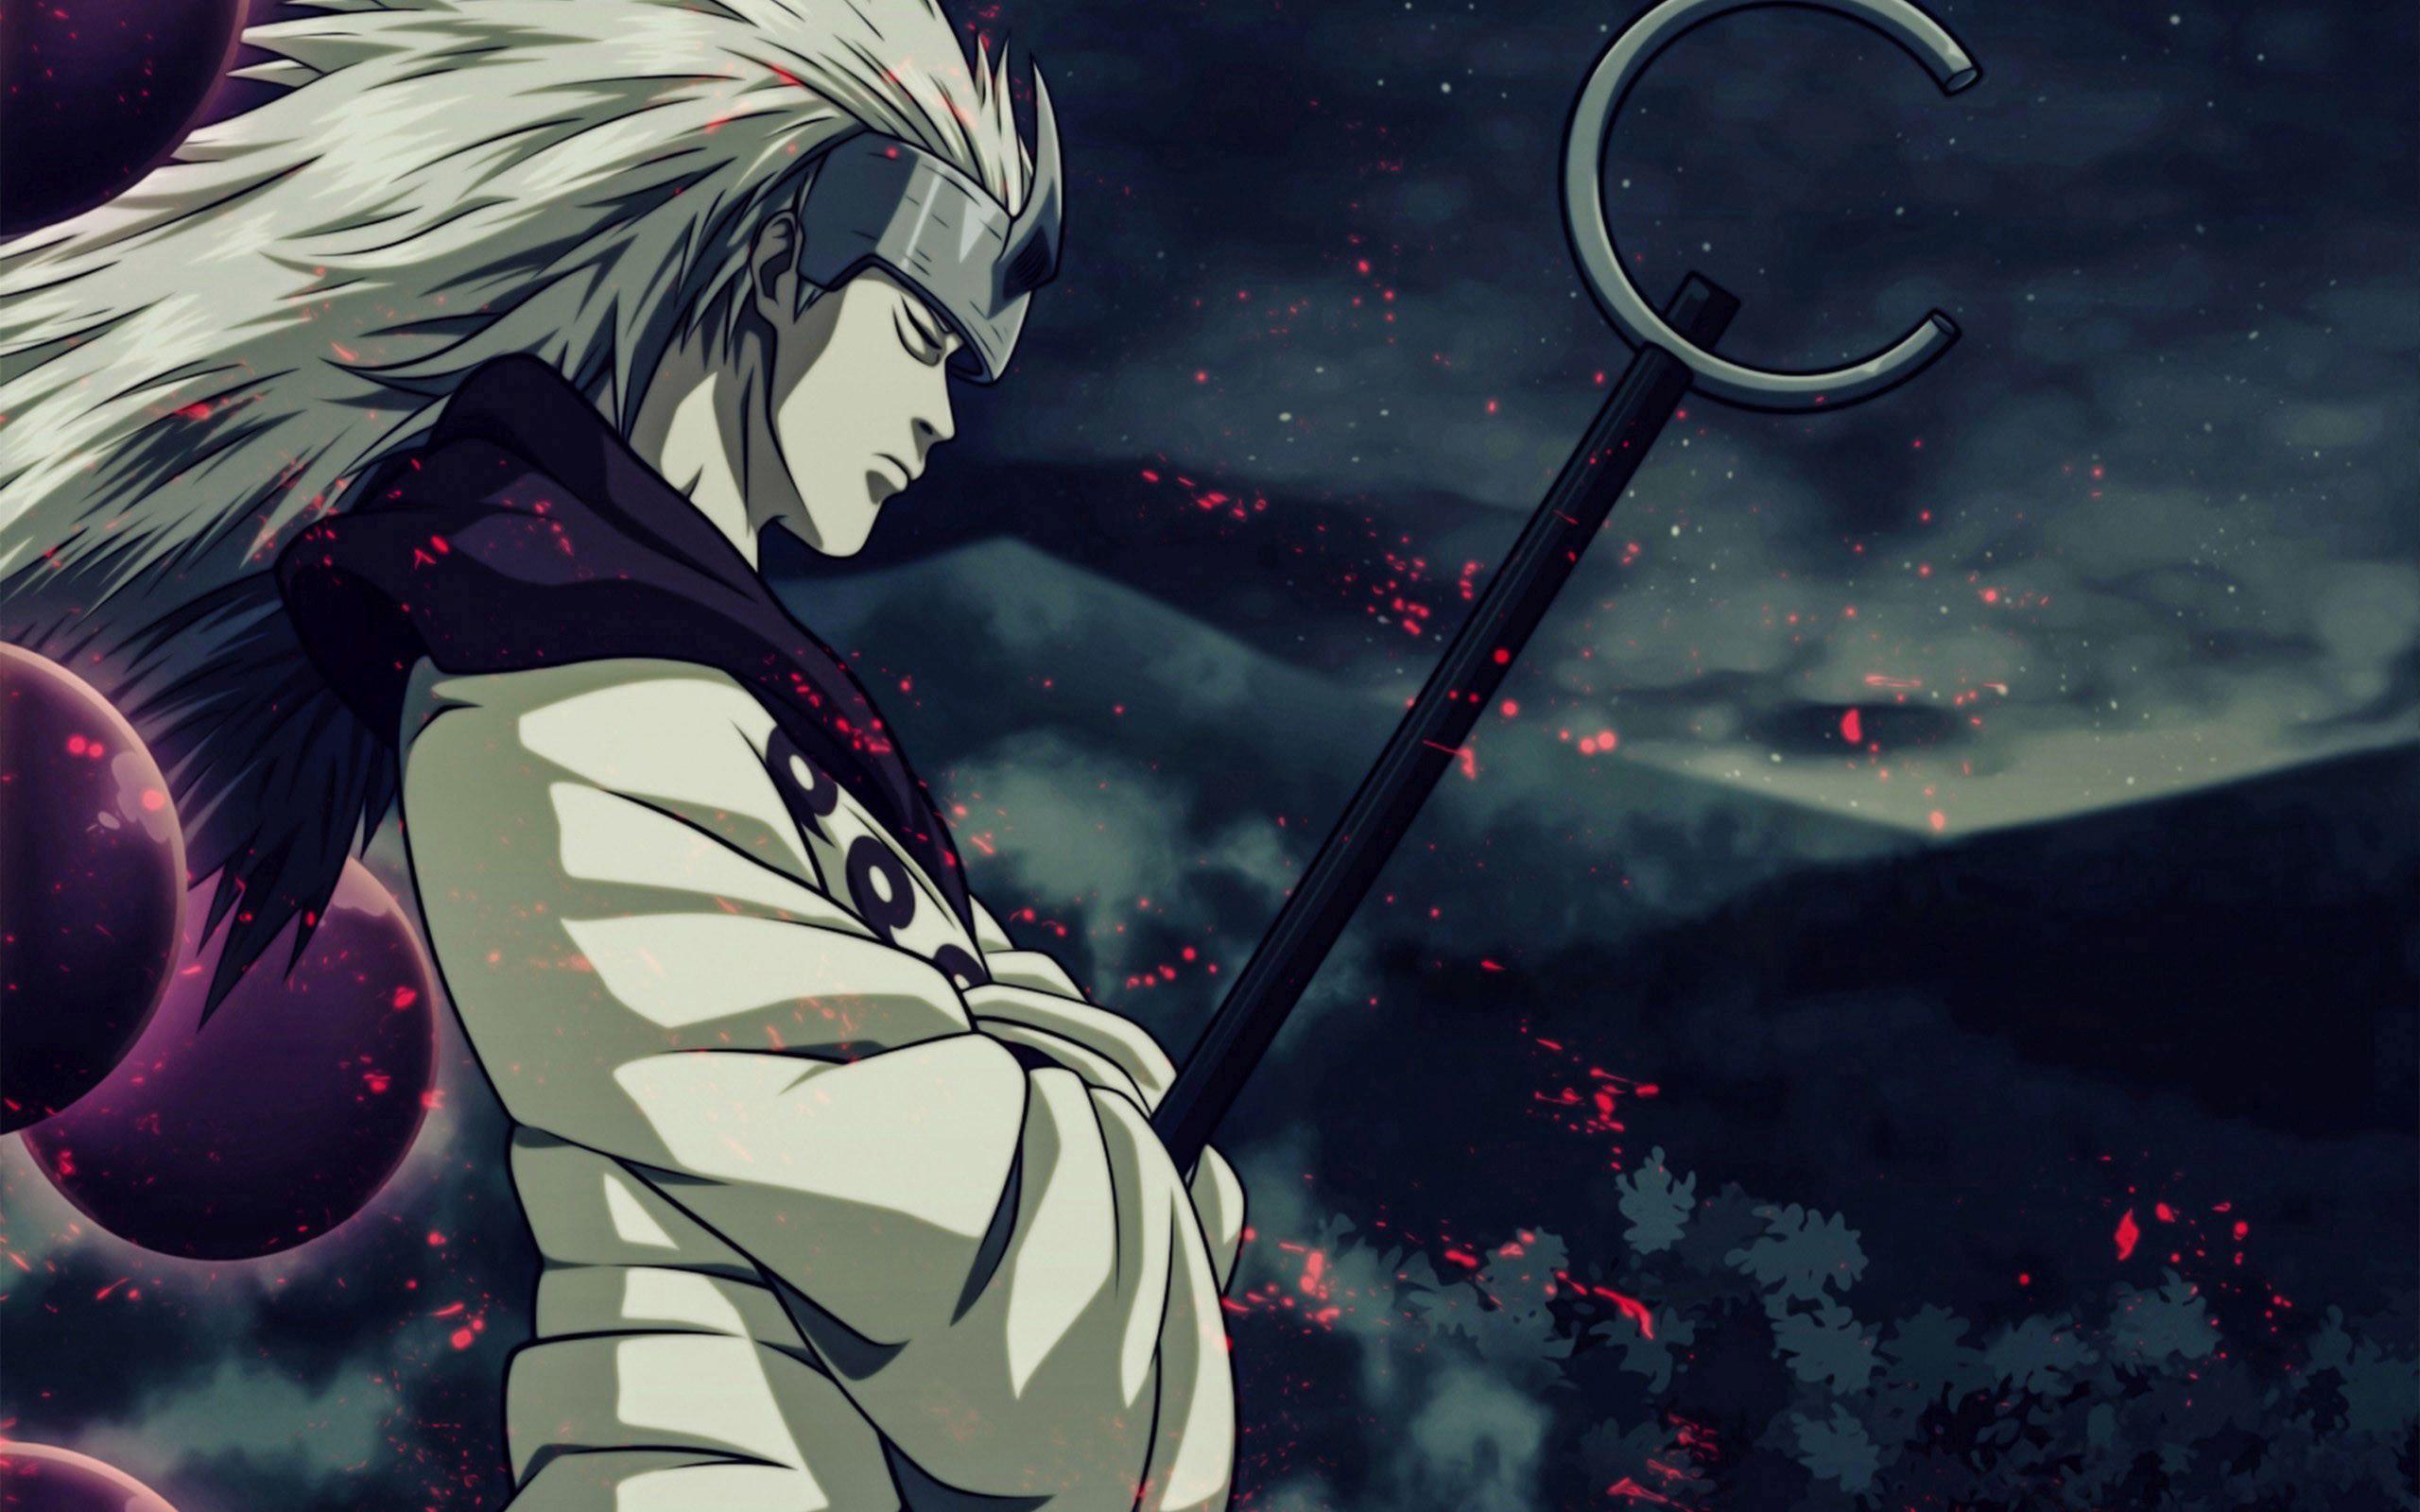 Naruto Shippuden Wallpaper Background As Wallpaper HD